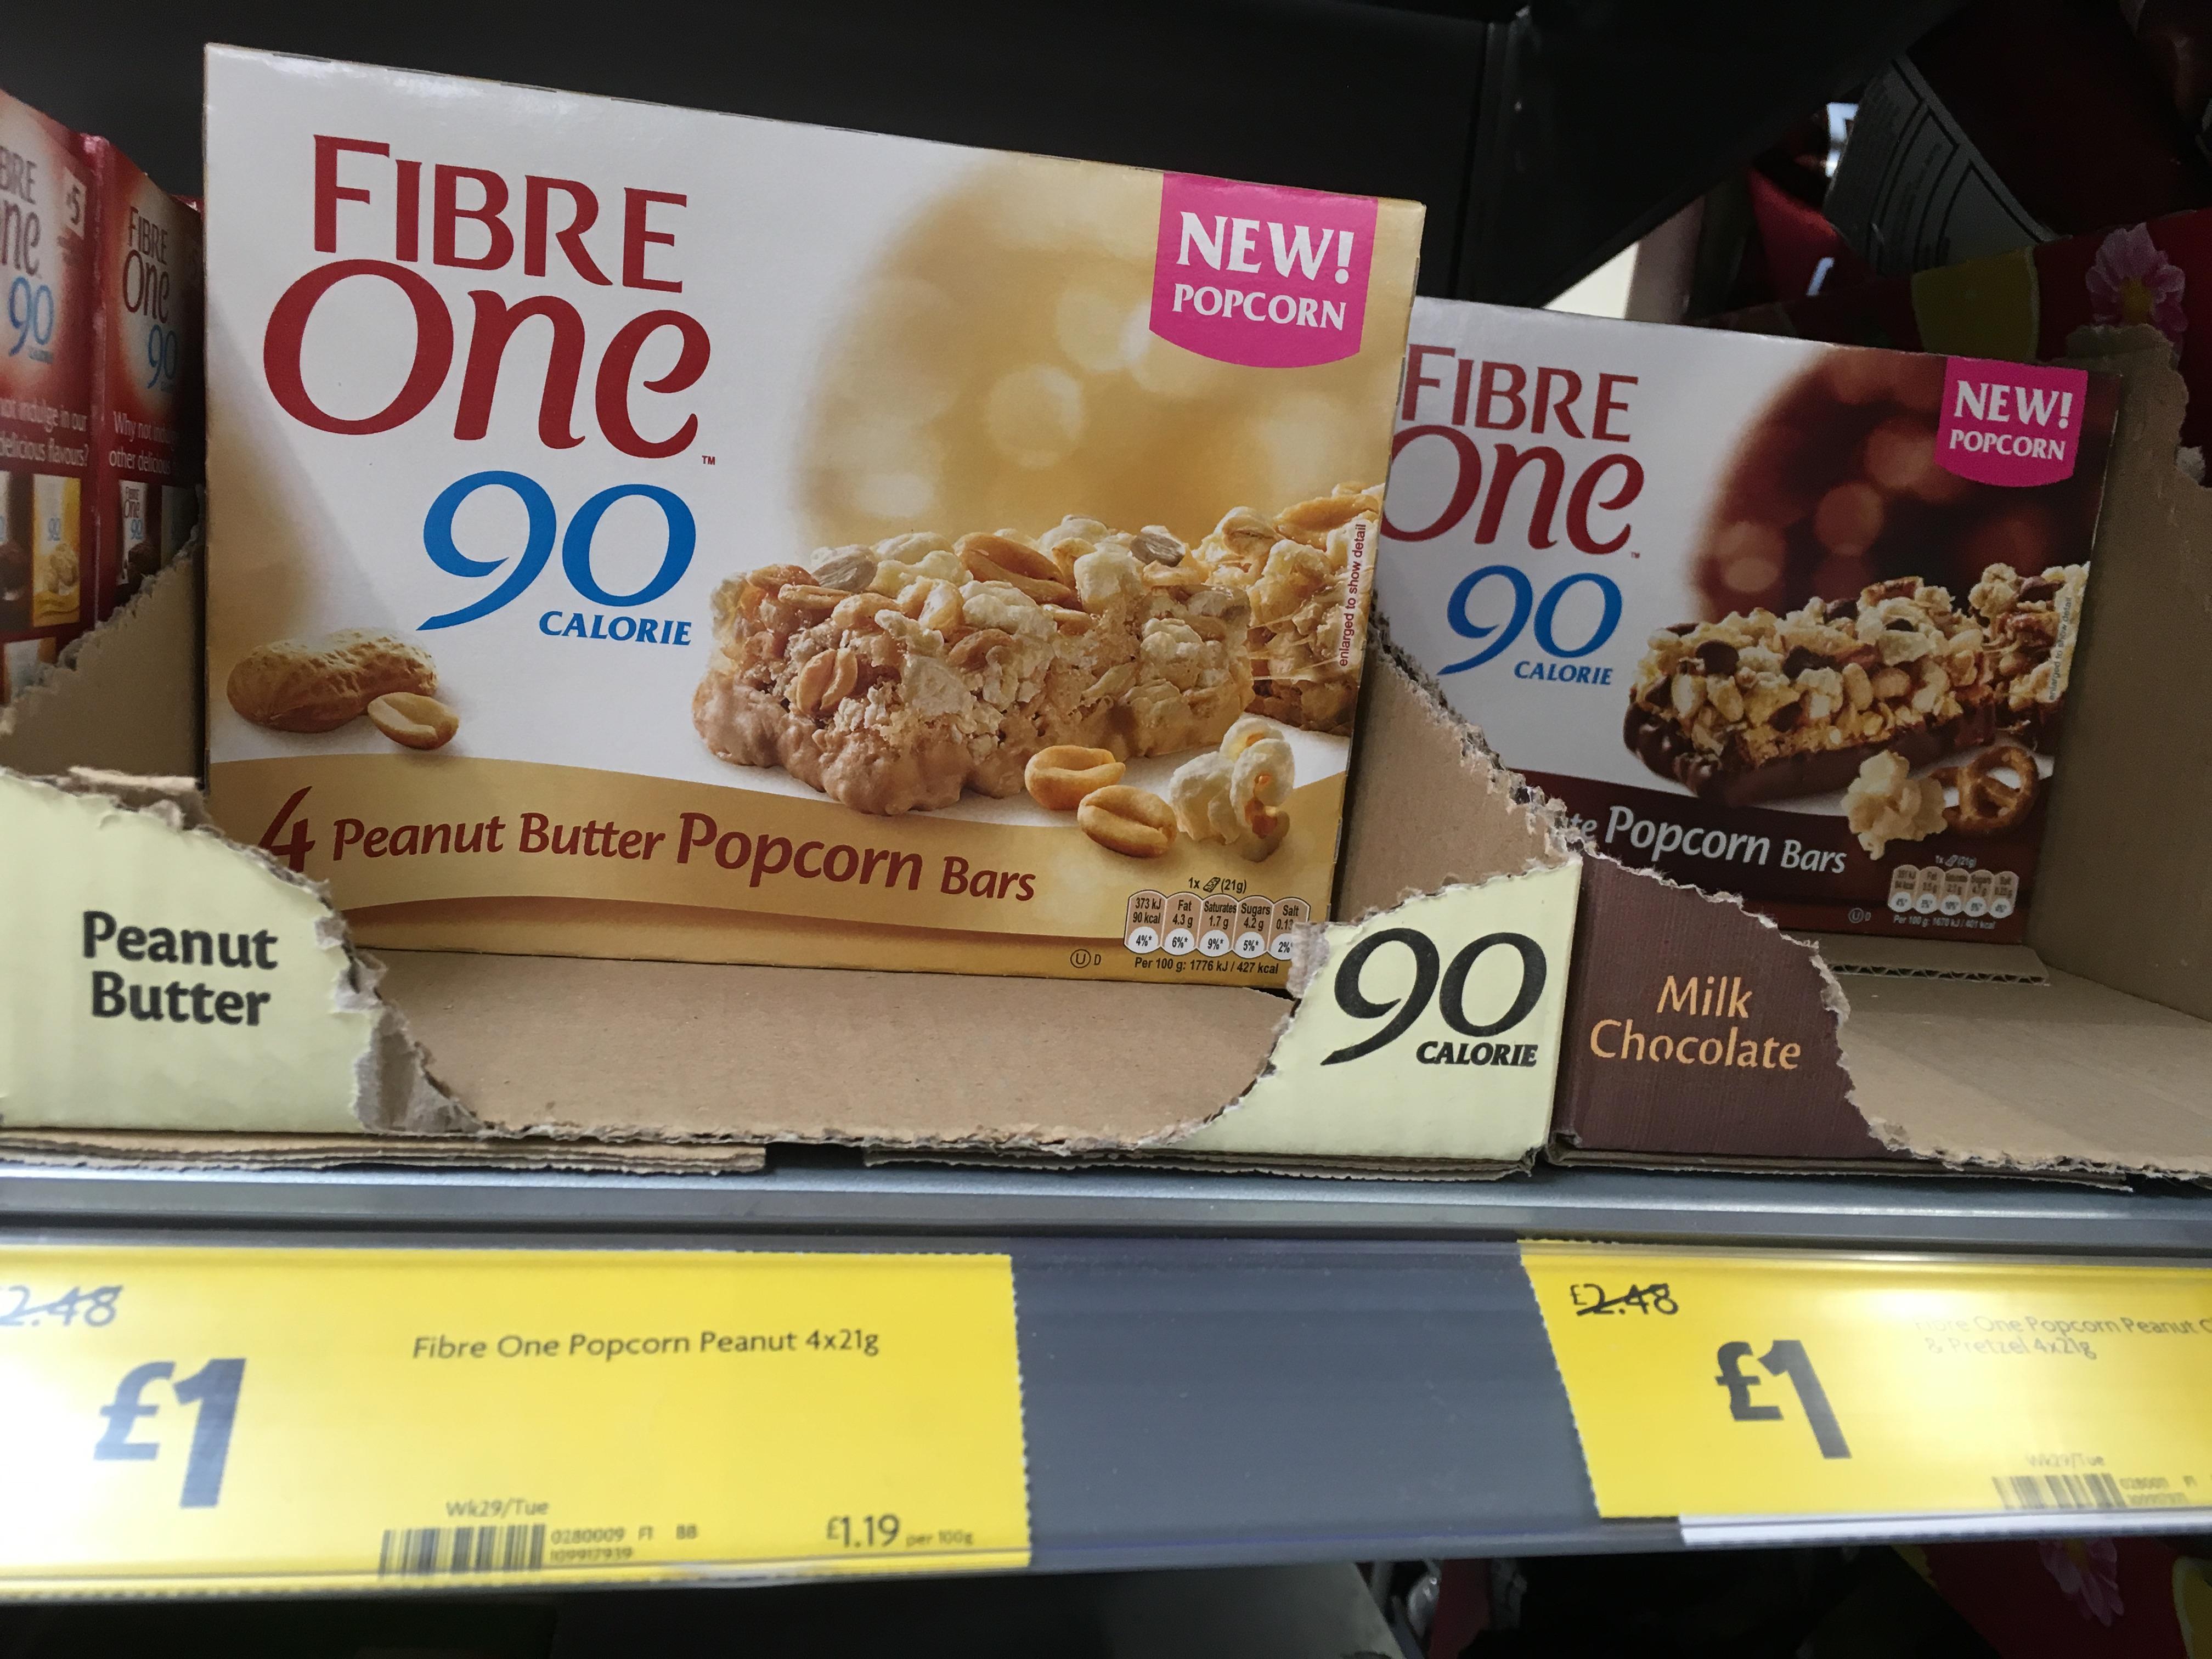 Fibre One Popcorn - £1 instore @ Morrisons